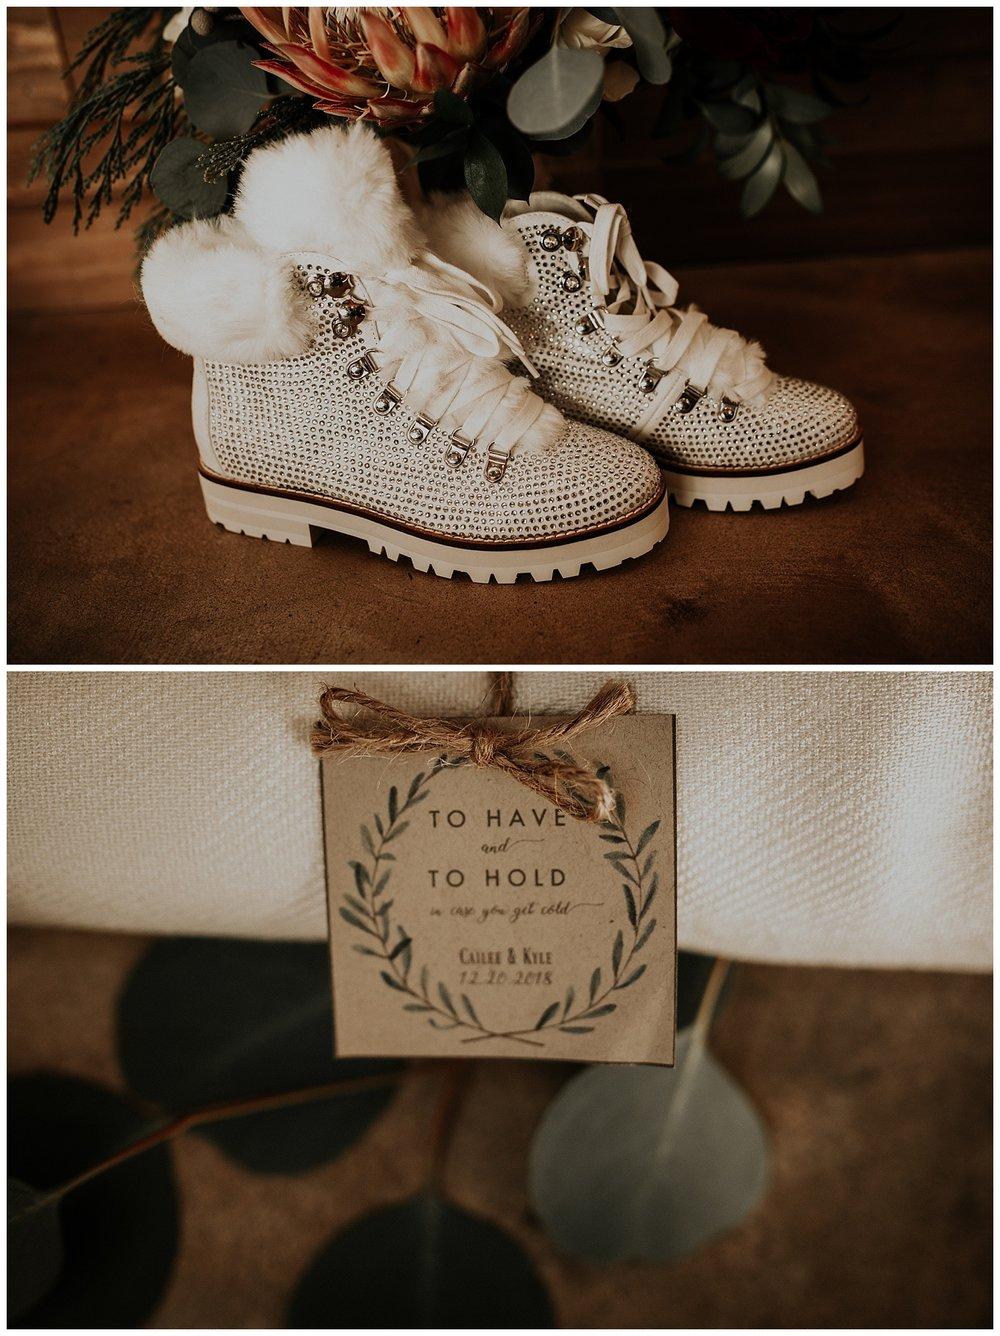 Laken-Mackenzie-Photography-Palm-Whispering-Oaks-Wedding-Venue-Dallas-Wedding-Photographer03.jpg